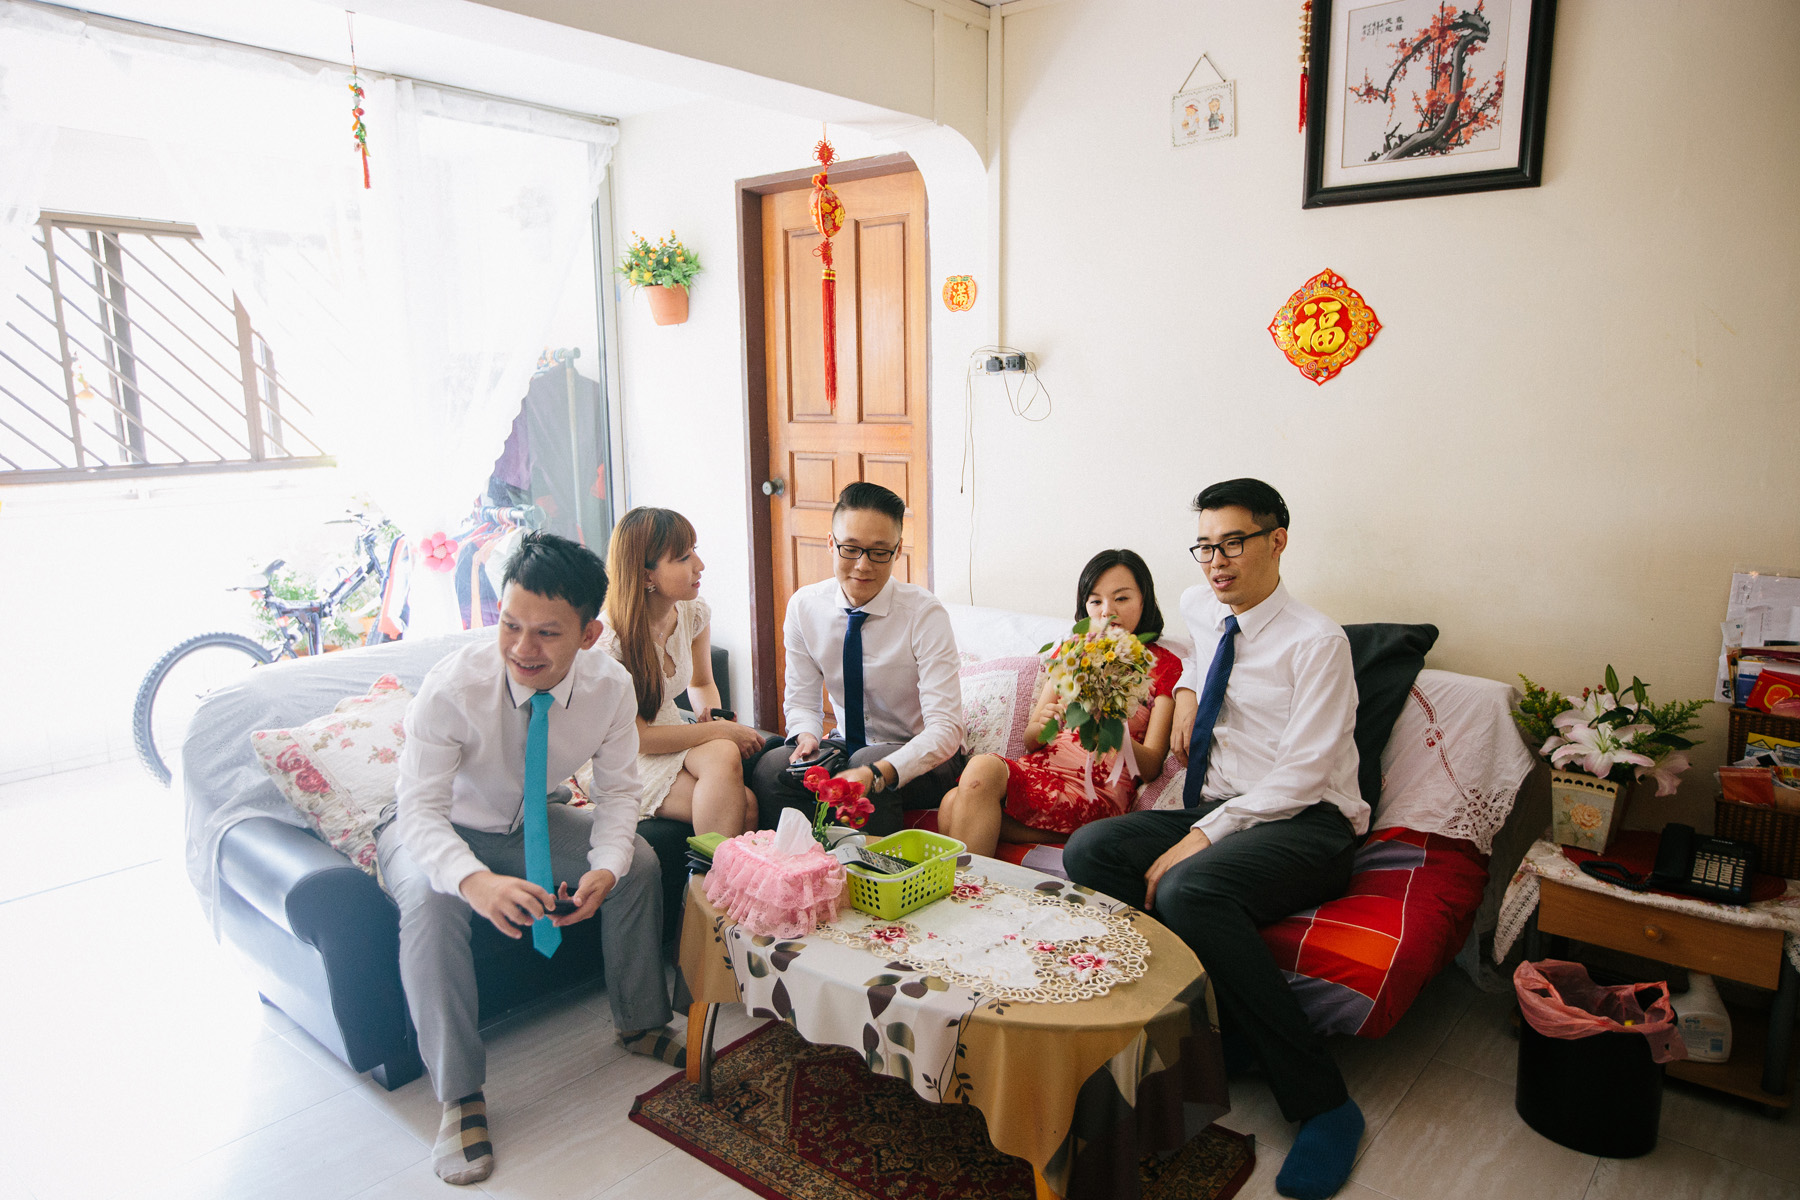 singapore-wedding-travel-photographer-faith-alvin-wedding-wmt-16.jpg